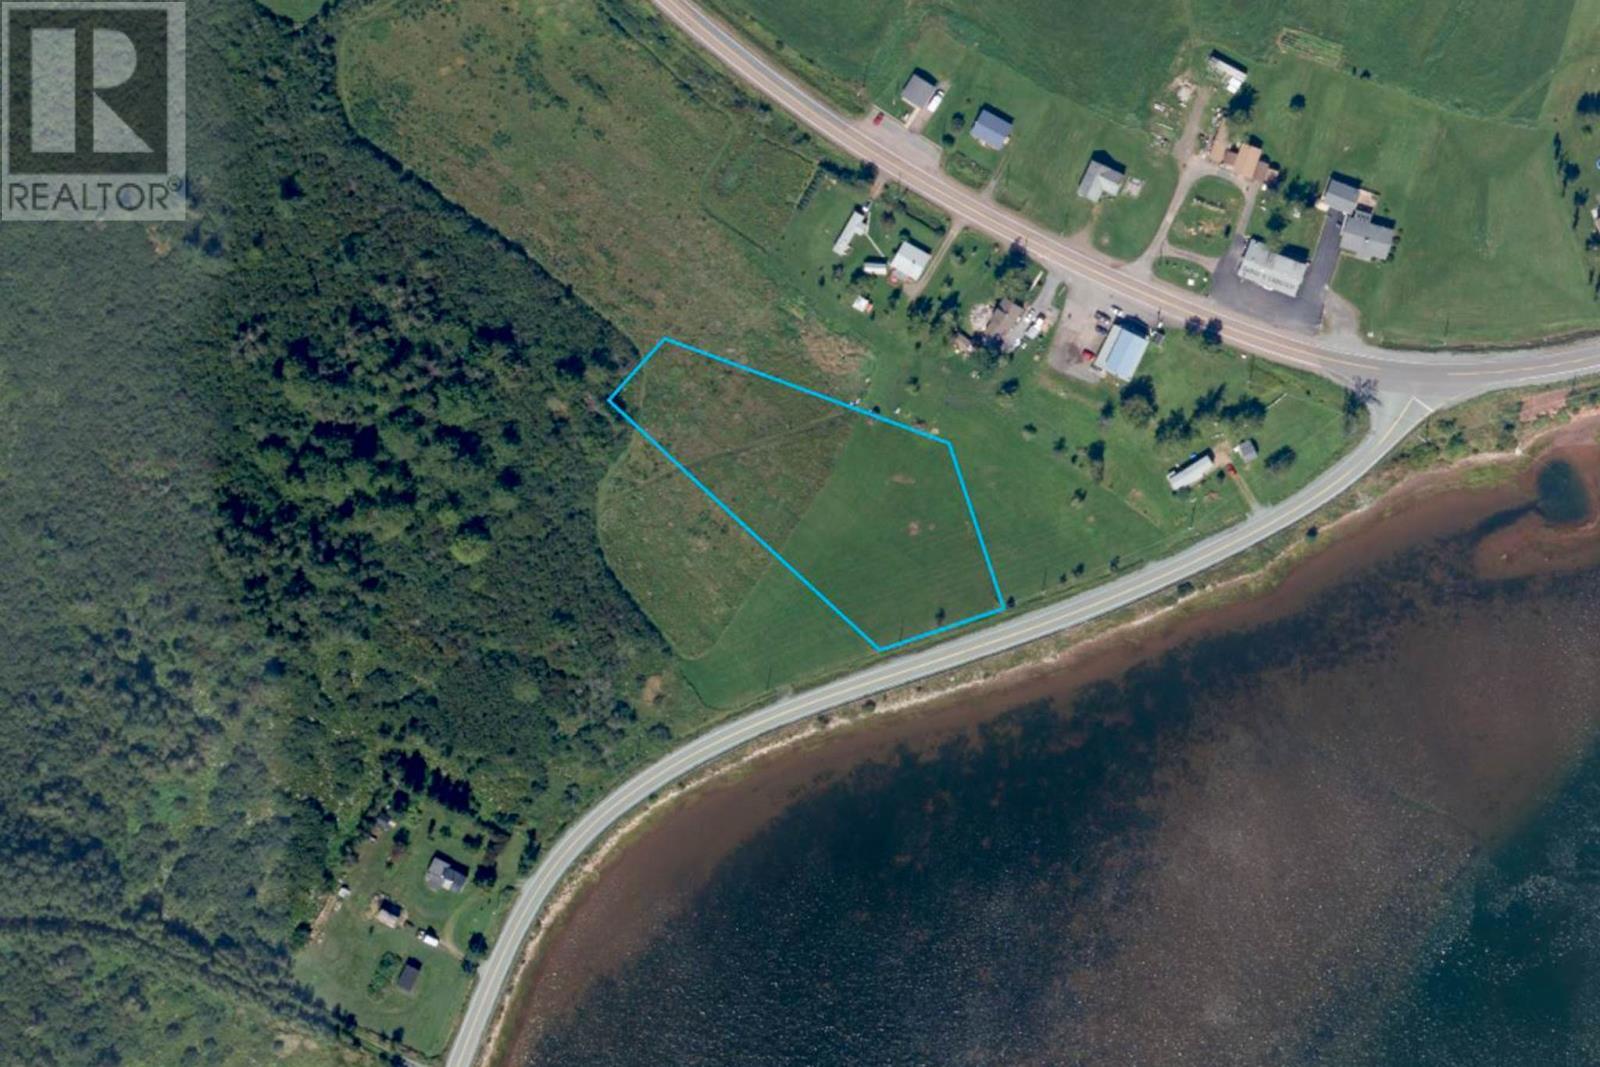 Lot 19-4 Kolbec Road, Port Howe, Nova Scotia  B0K 1K0 - Photo 1 - 202000813